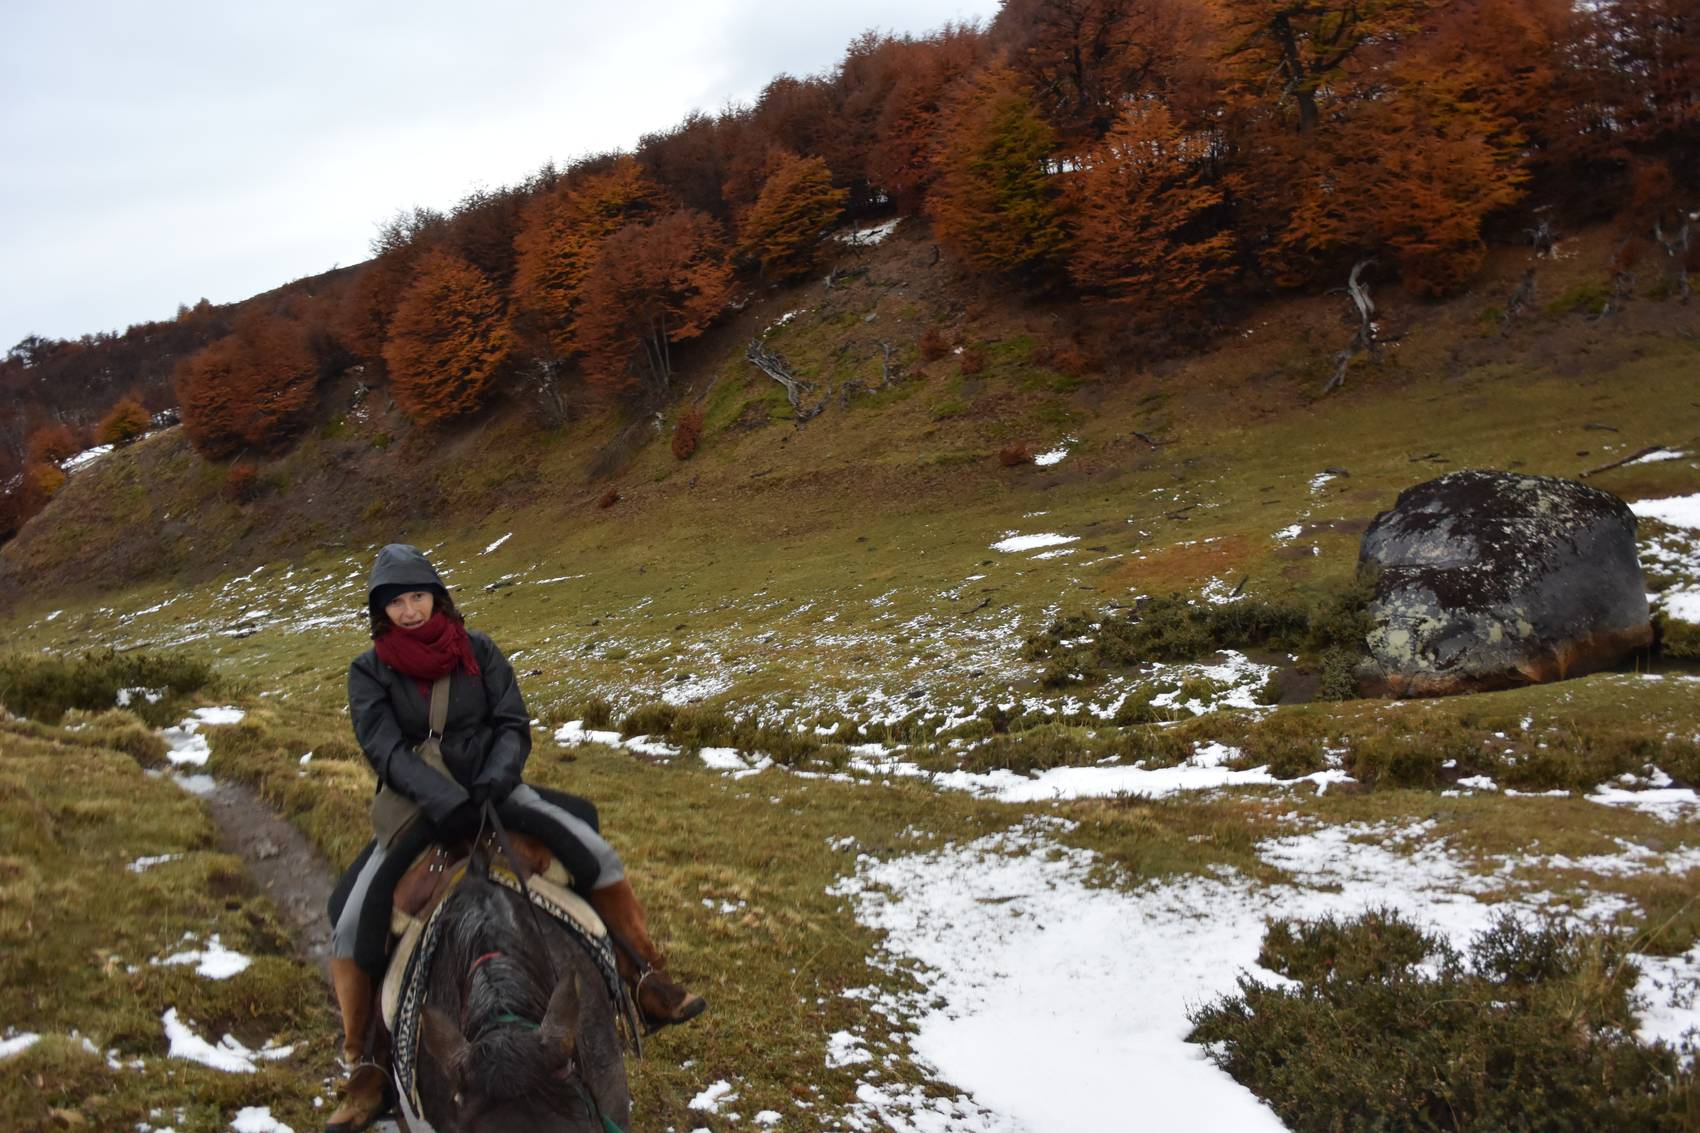 Cavalcade sous la pluie en Patagonie